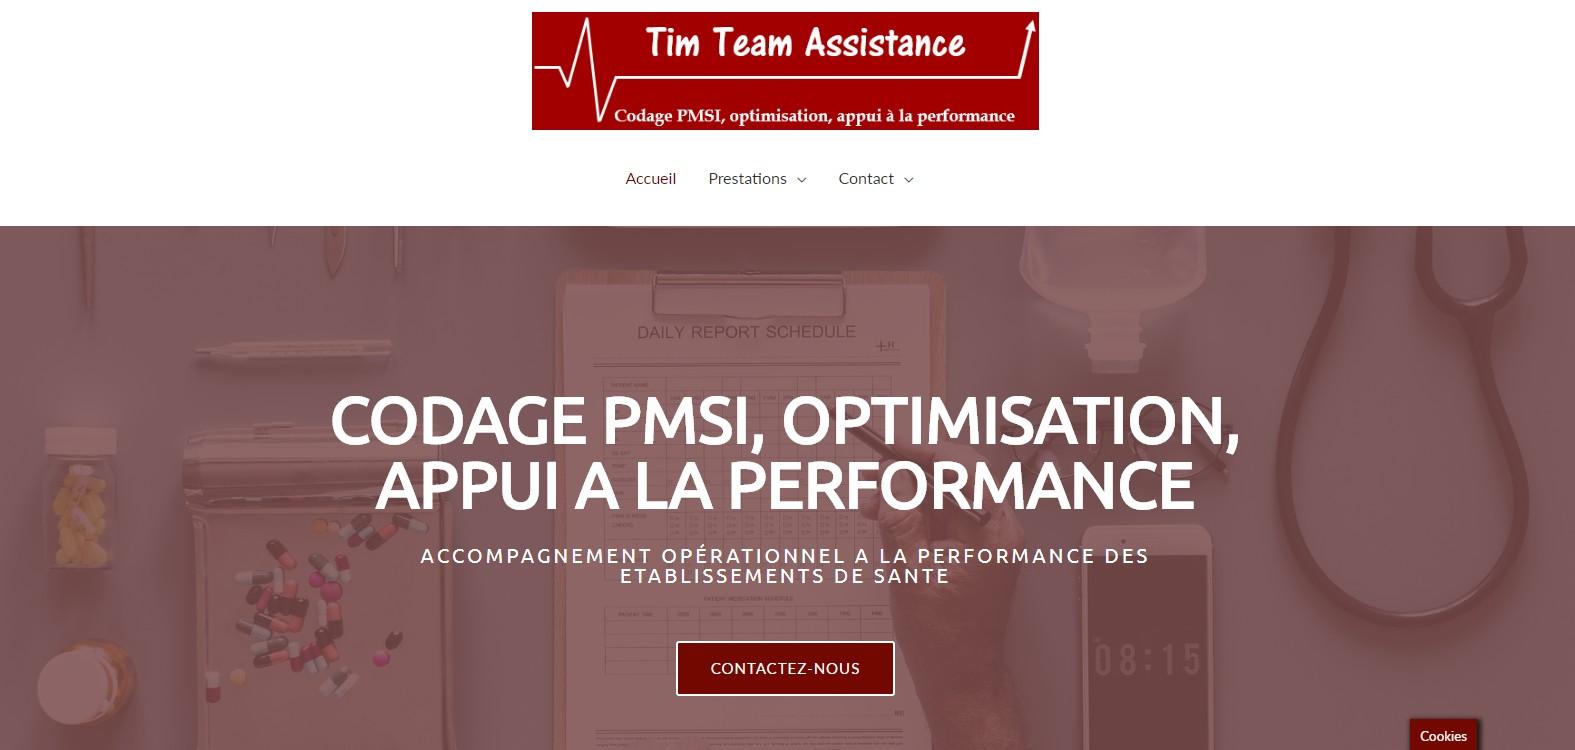 Tim Team Assistance - page d'accueil